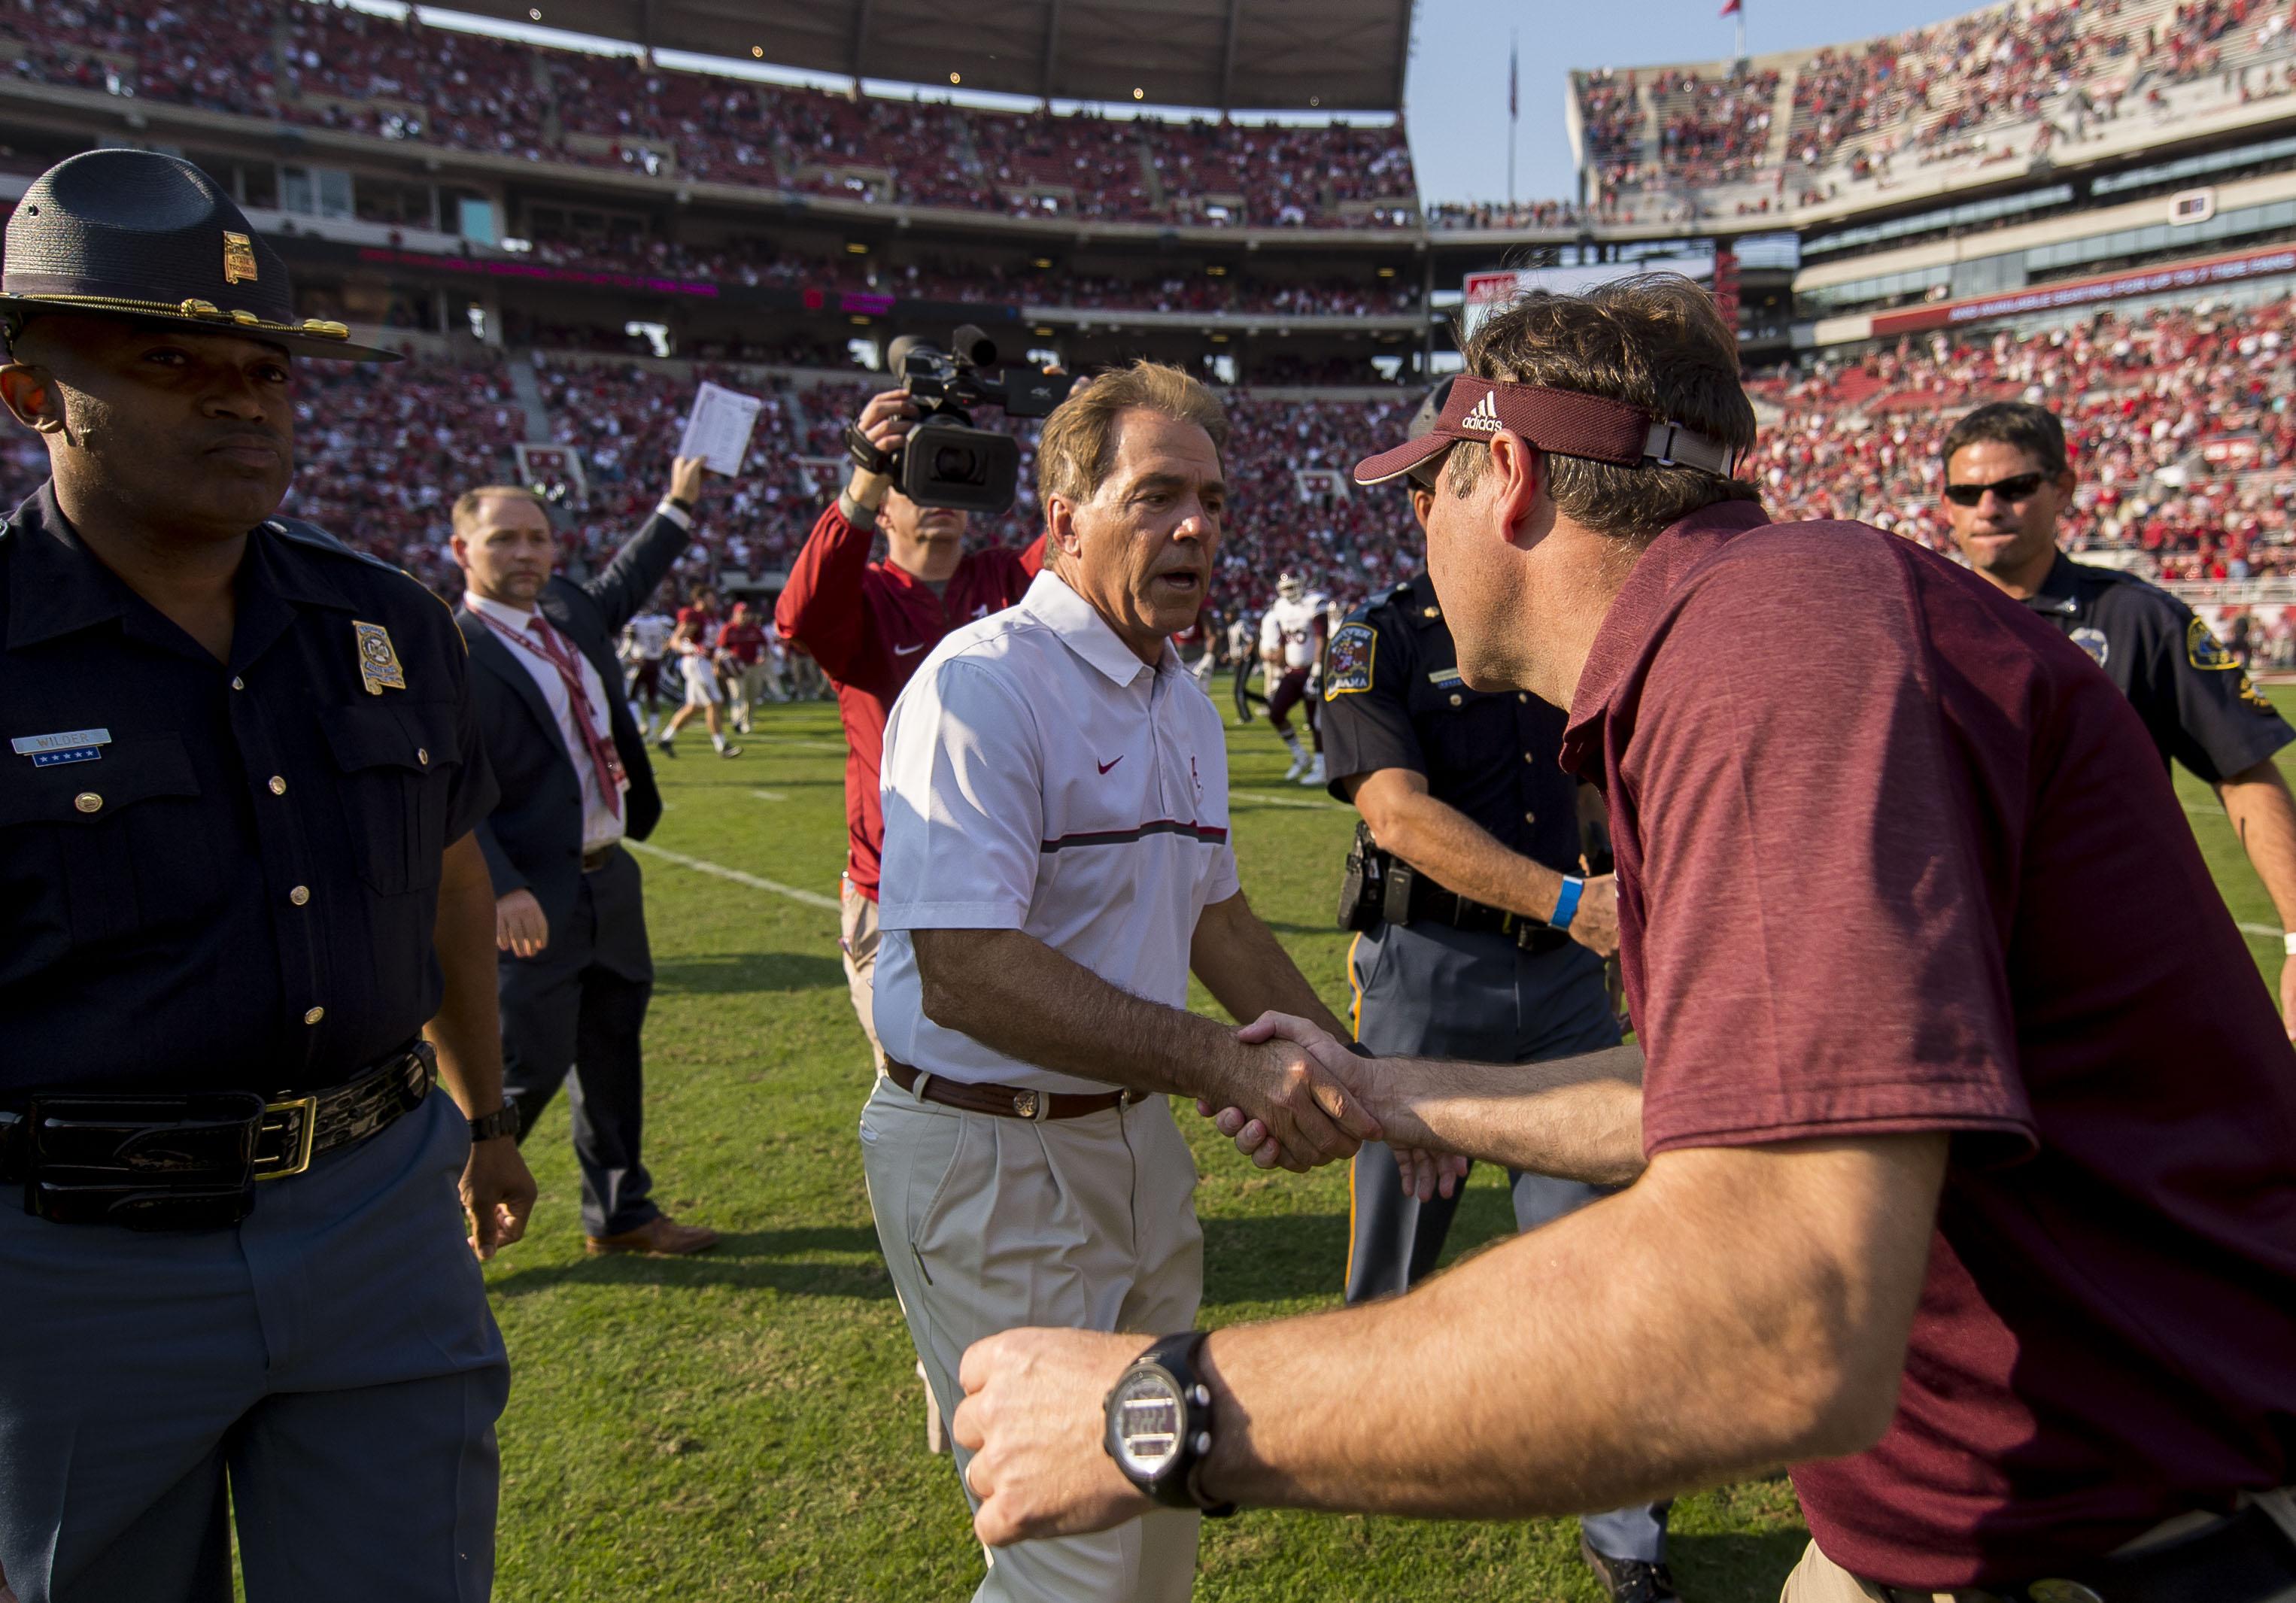 Alabama head coach Nick Saban greets Mississippi State head coach Dan Mullen after their NCAA college football game, Saturday, Nov. 12, 2016, at Bryant-Denny Stadium in Tuscaloosa, Ala. (Vasha Hunt/AL.com via AP) (AP Photo/Alabama Media Group, Vasha Hunt)